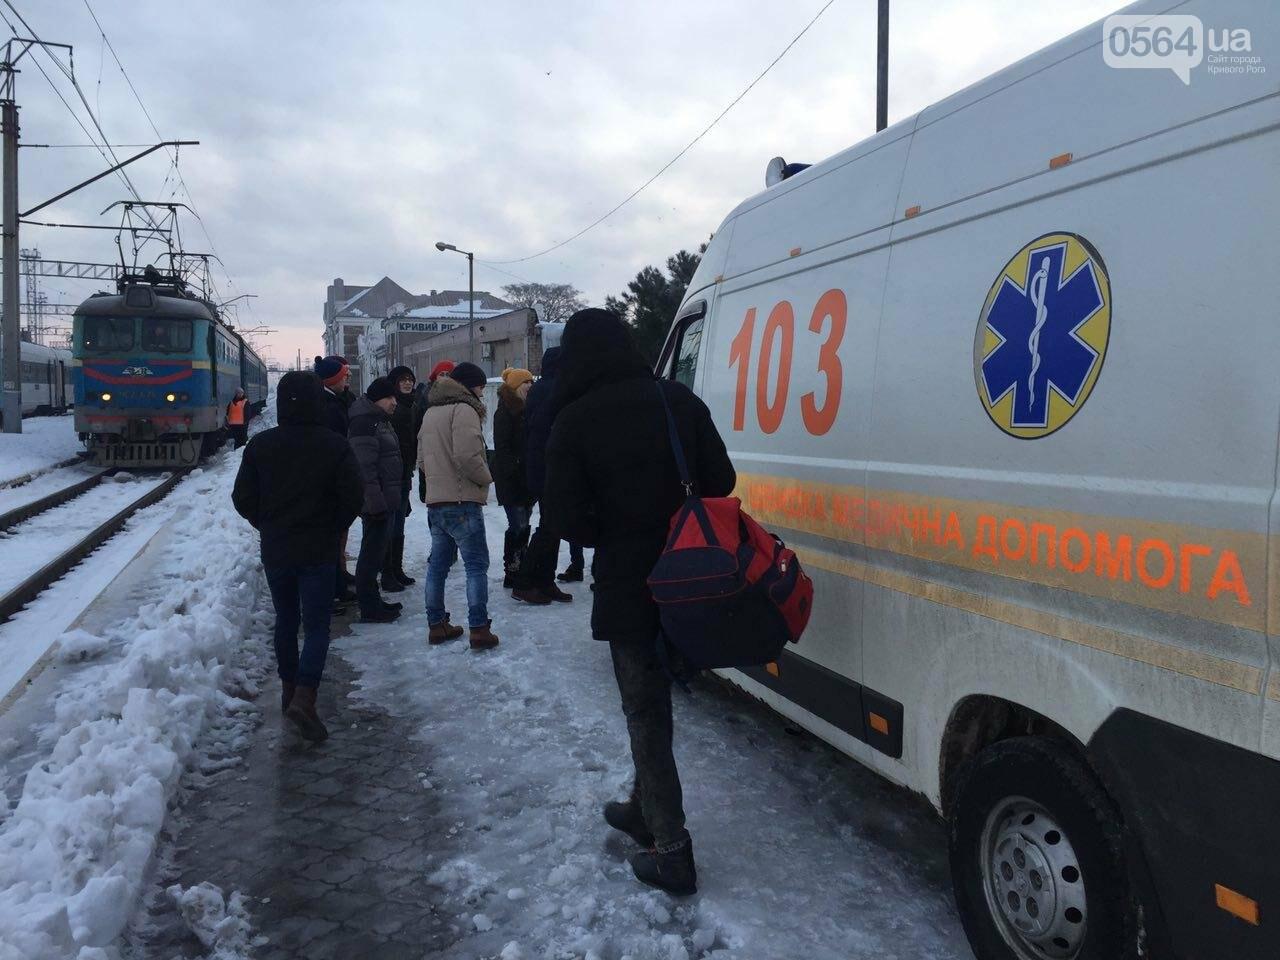 В Кривой Рог вернулся журналист Вячеслав Волк, тяжело раненый во время учений резервистов (ФОТО), фото-12